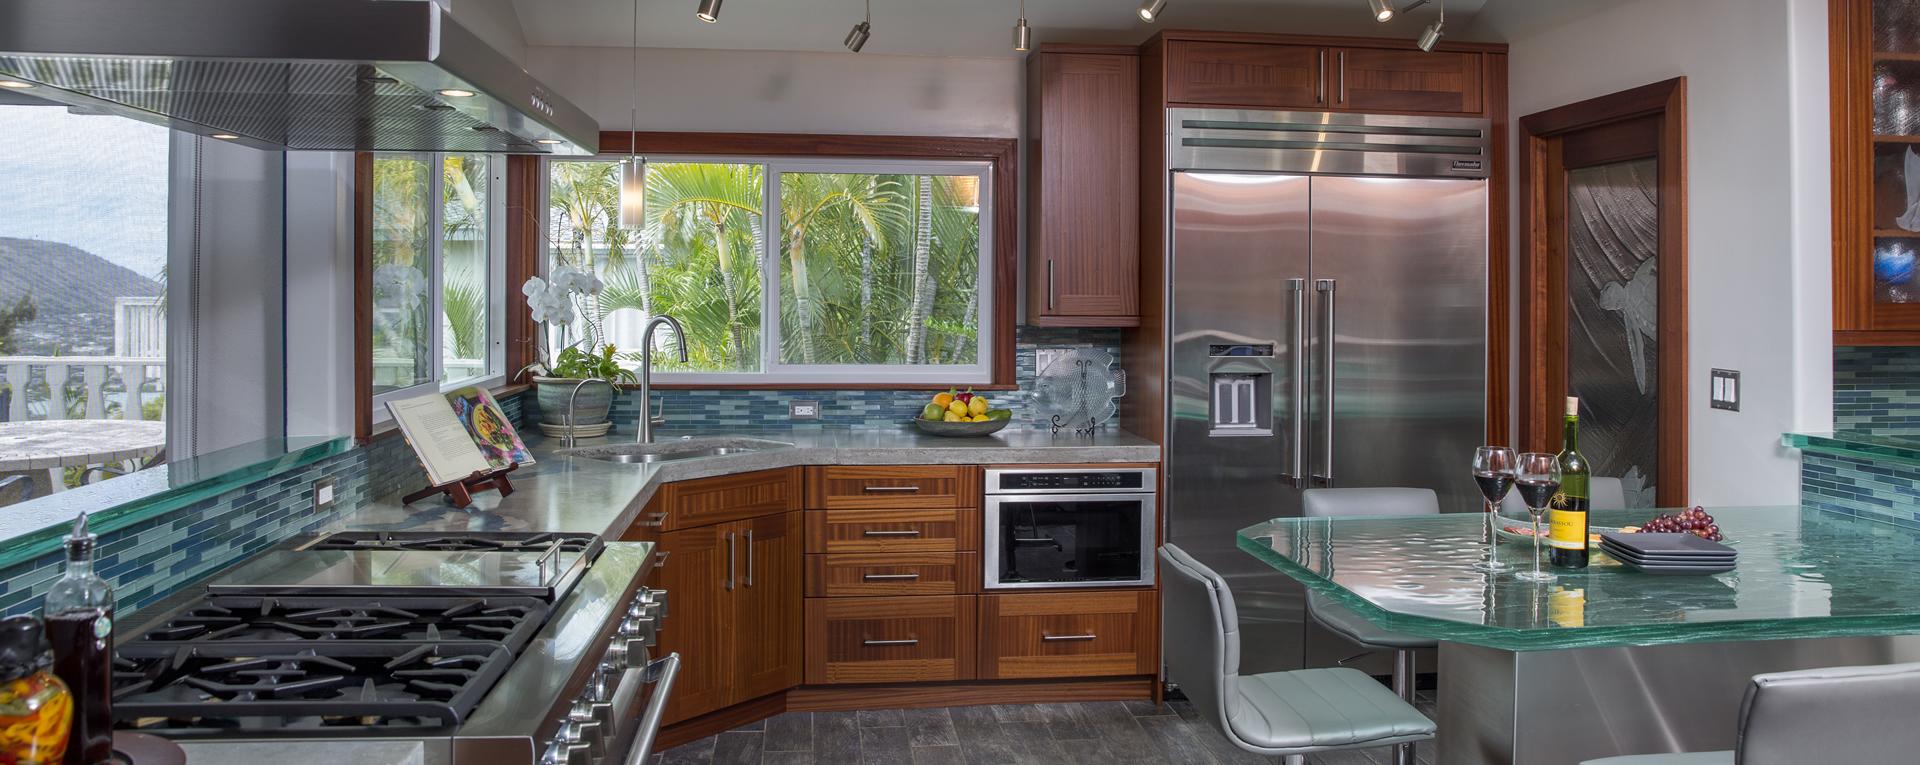 john-cook-kitchen-photo-b